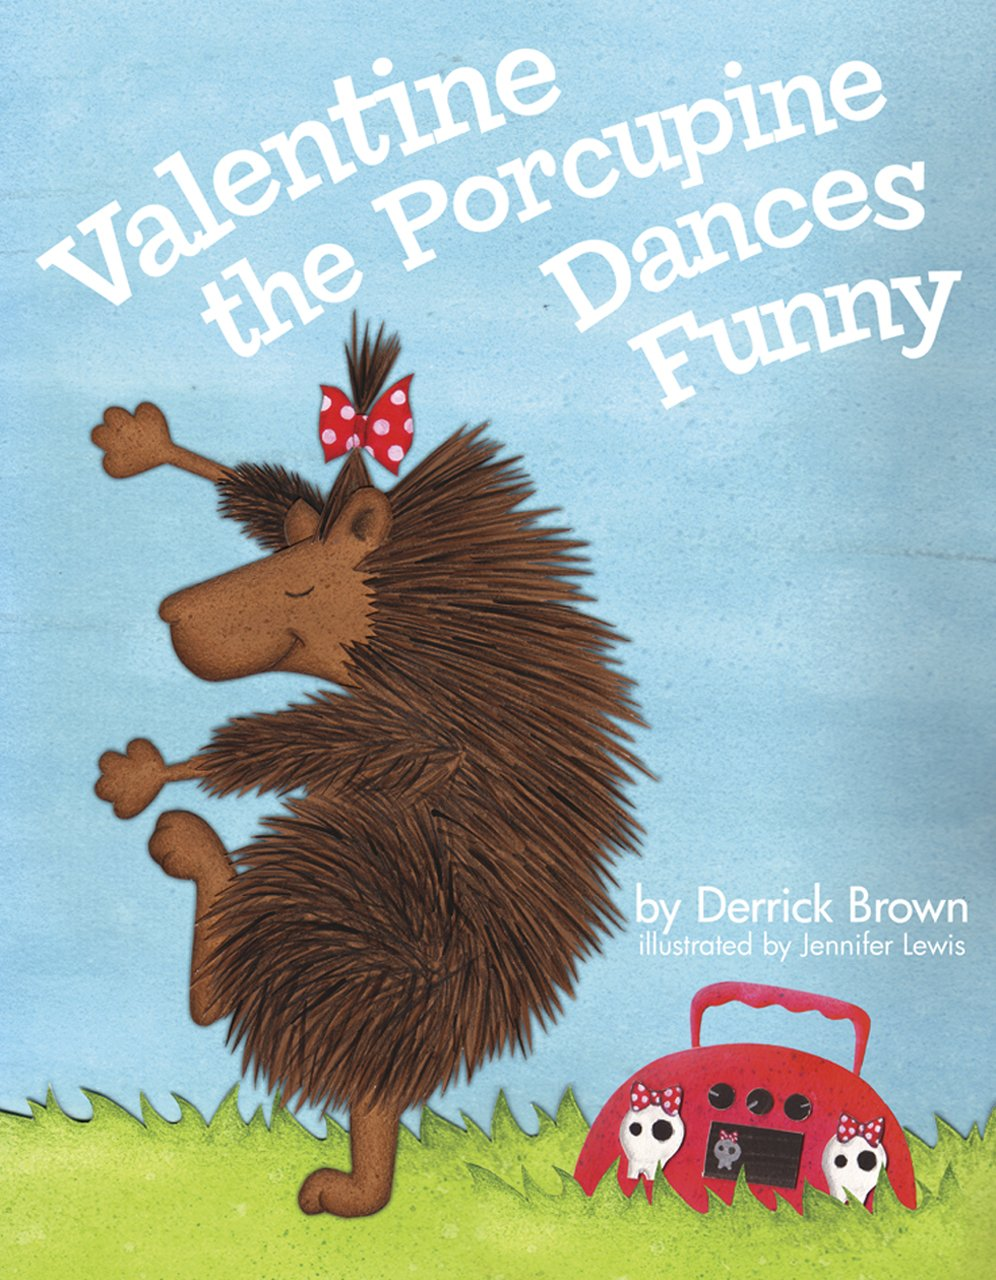 Valentine the Porcupine Dances Funny